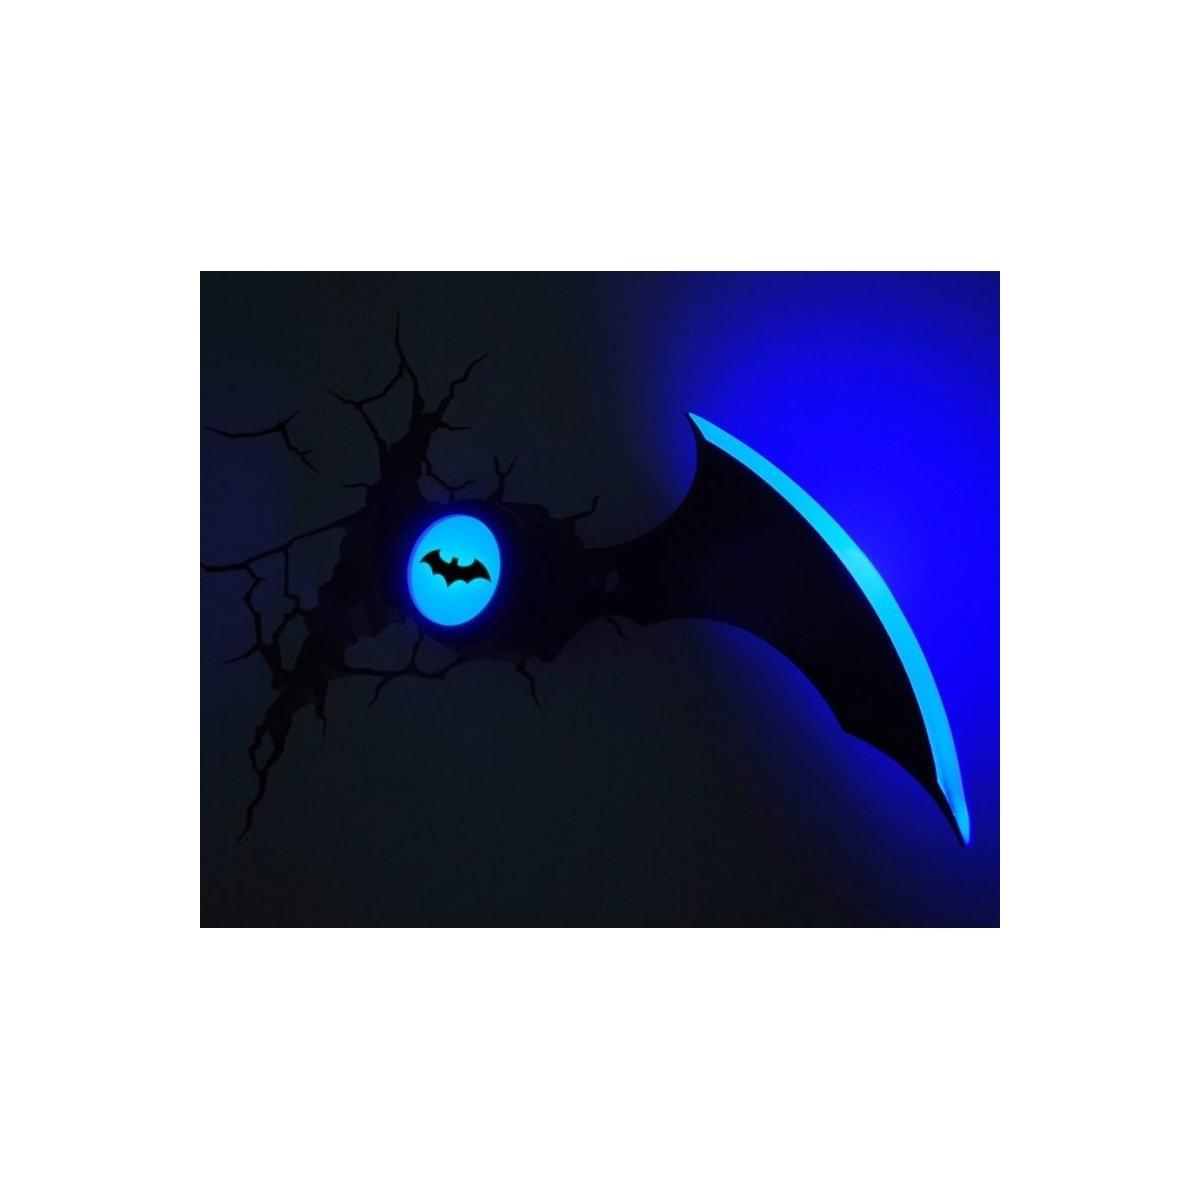 batman lampe 3d led batarang figurine discount. Black Bedroom Furniture Sets. Home Design Ideas